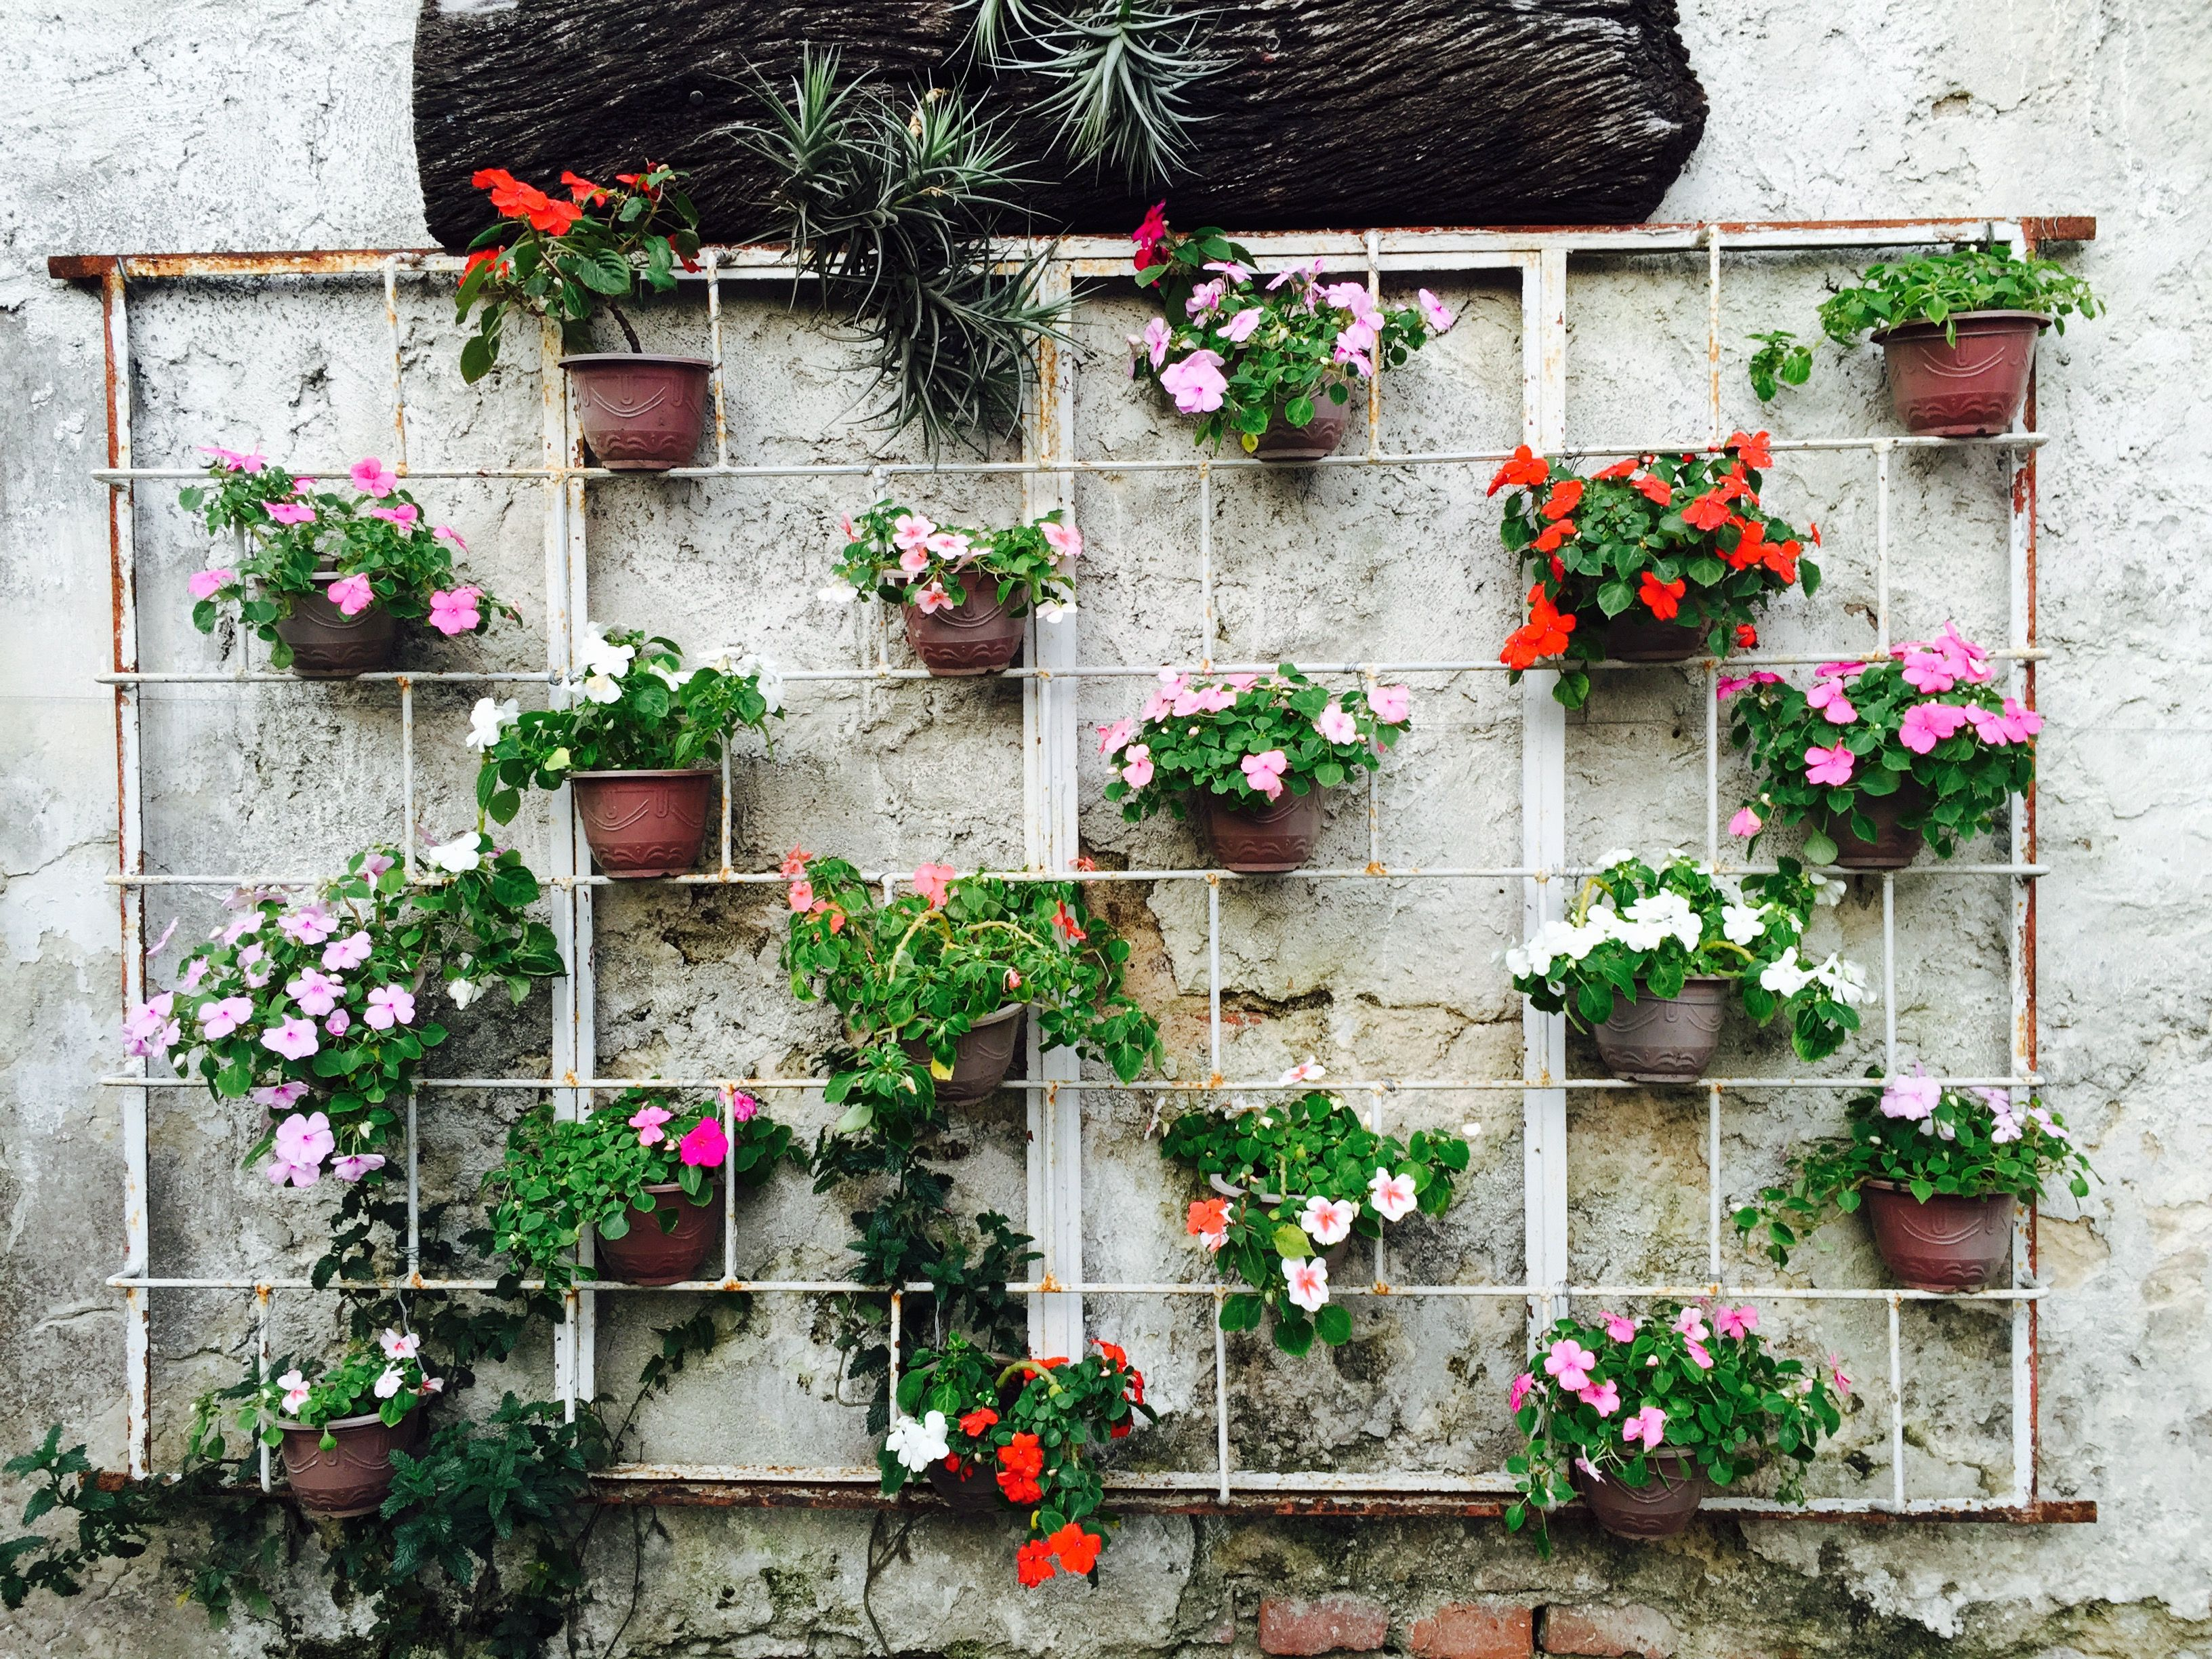 Ventana vieja reutilizada para colgar macetas con alegr as for Ideas para colgar plantas